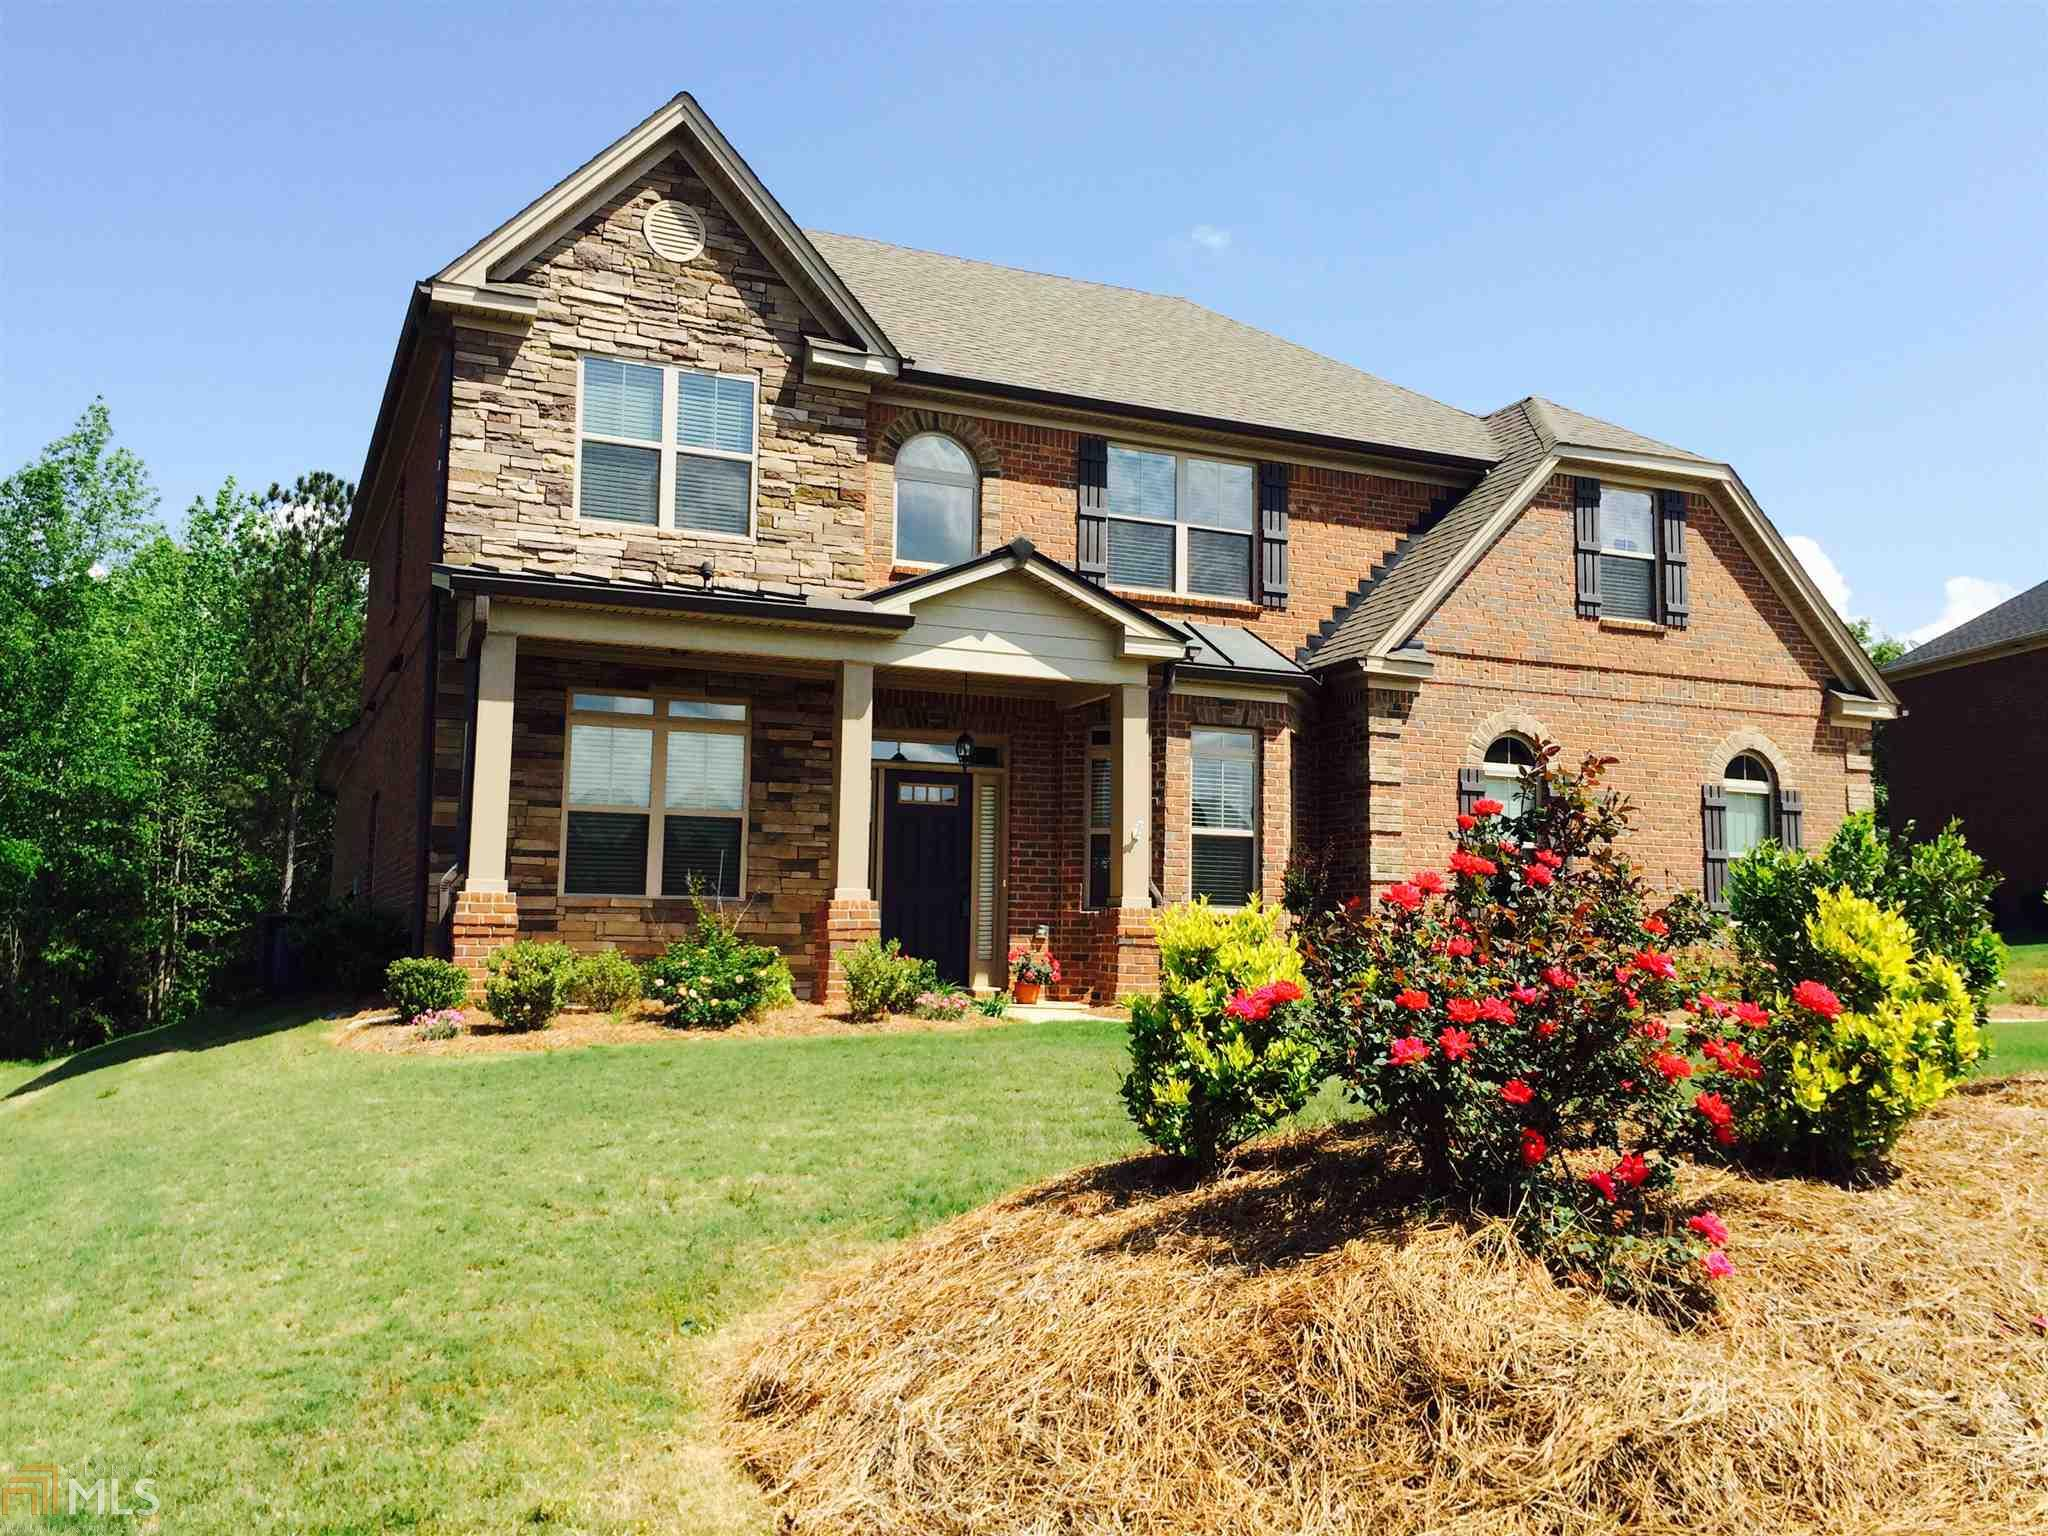 Eagles Brooke Locust Grove Homes For Sale